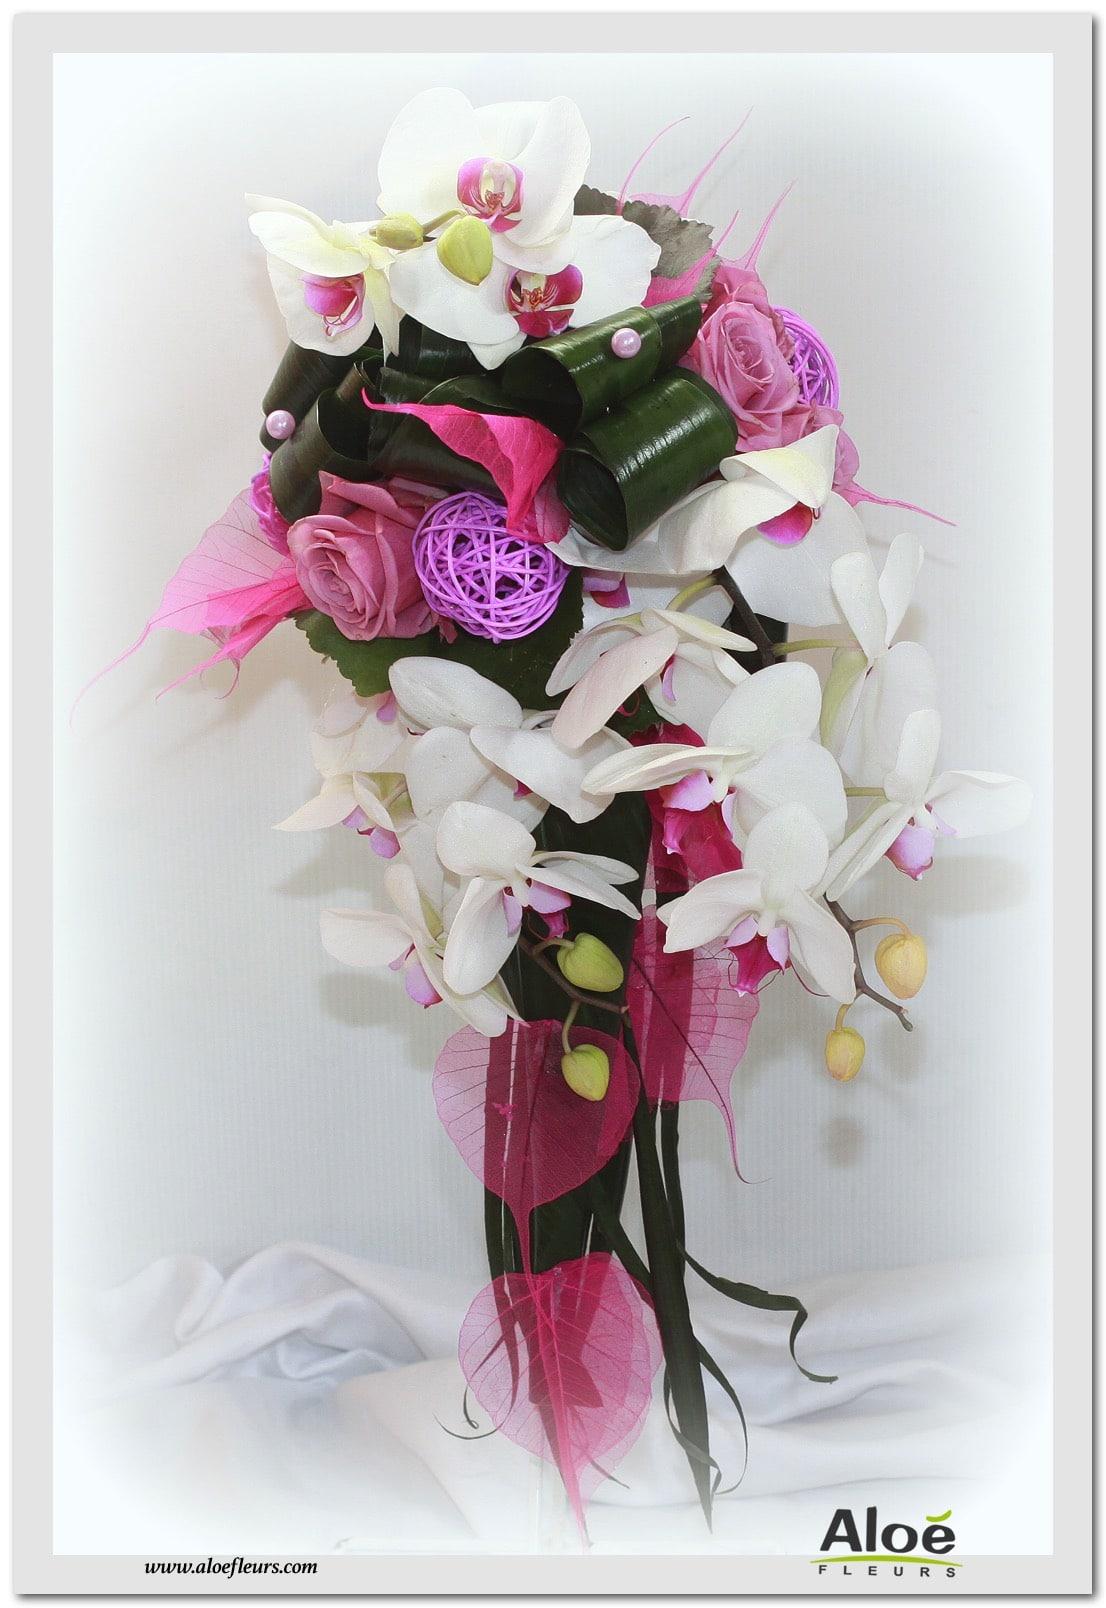 bouquets de mari e cascade en images aloe fleurs. Black Bedroom Furniture Sets. Home Design Ideas